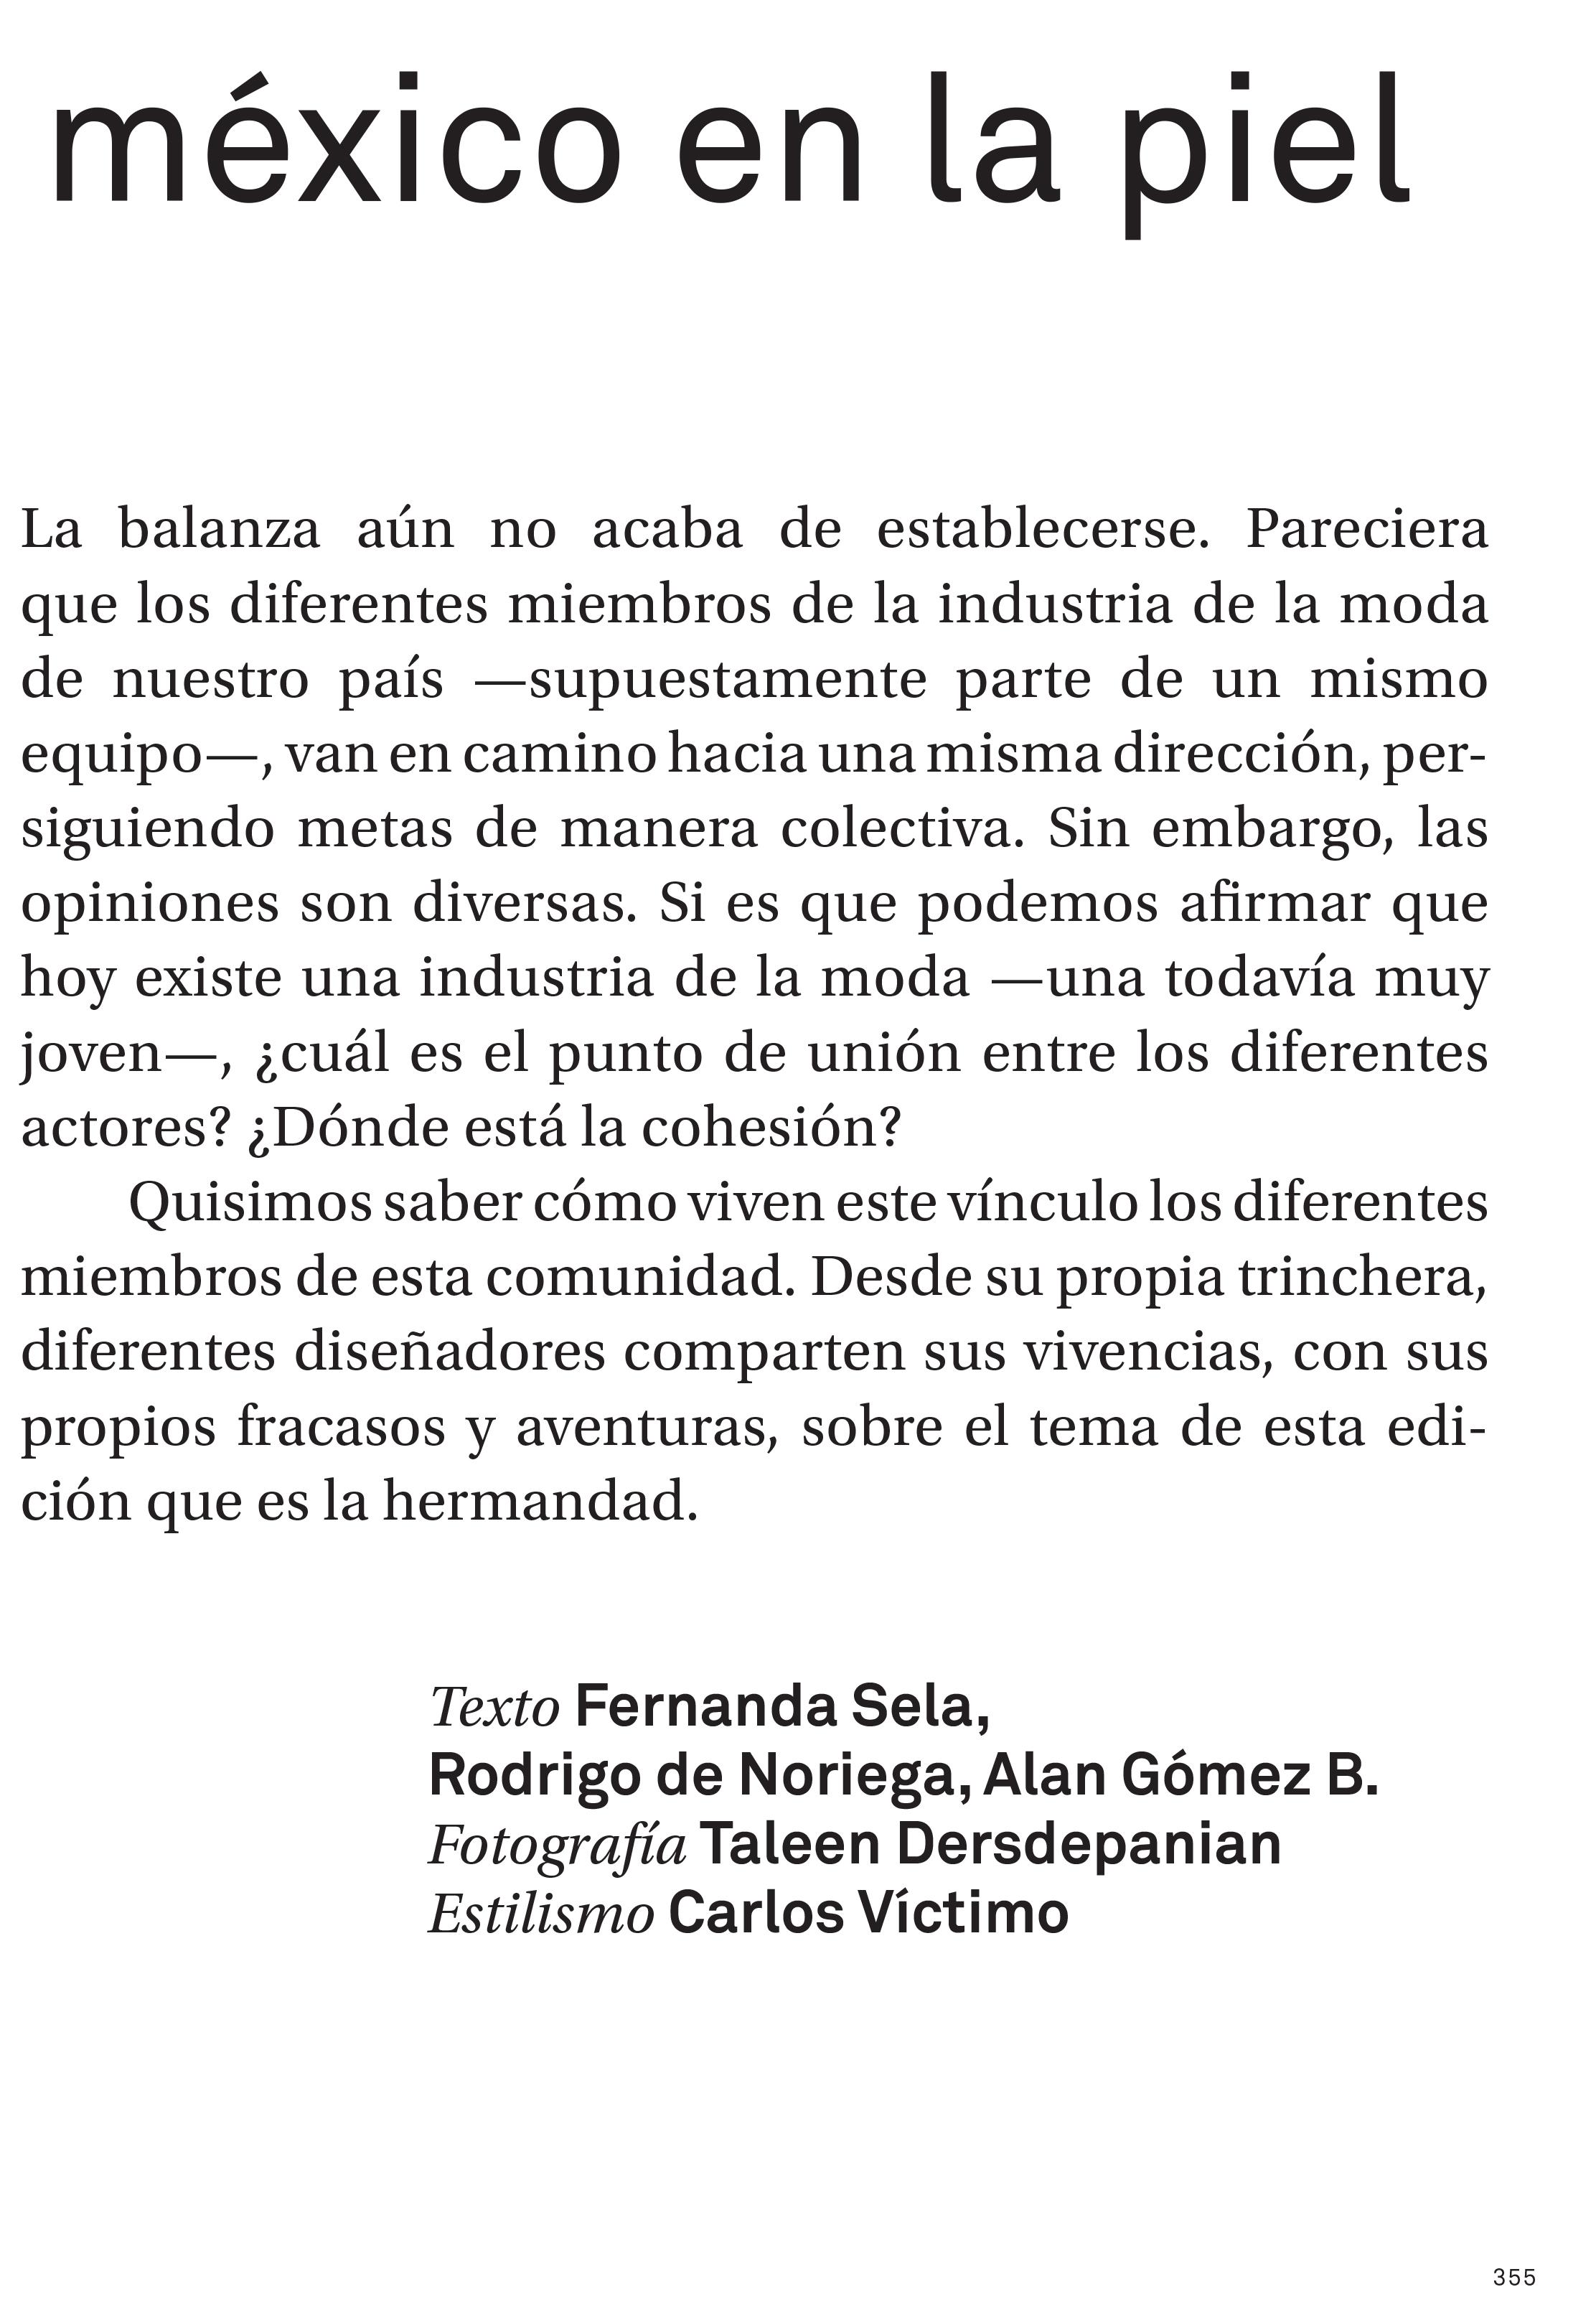 DISEÑADORES MEXICANOS-2.jpg